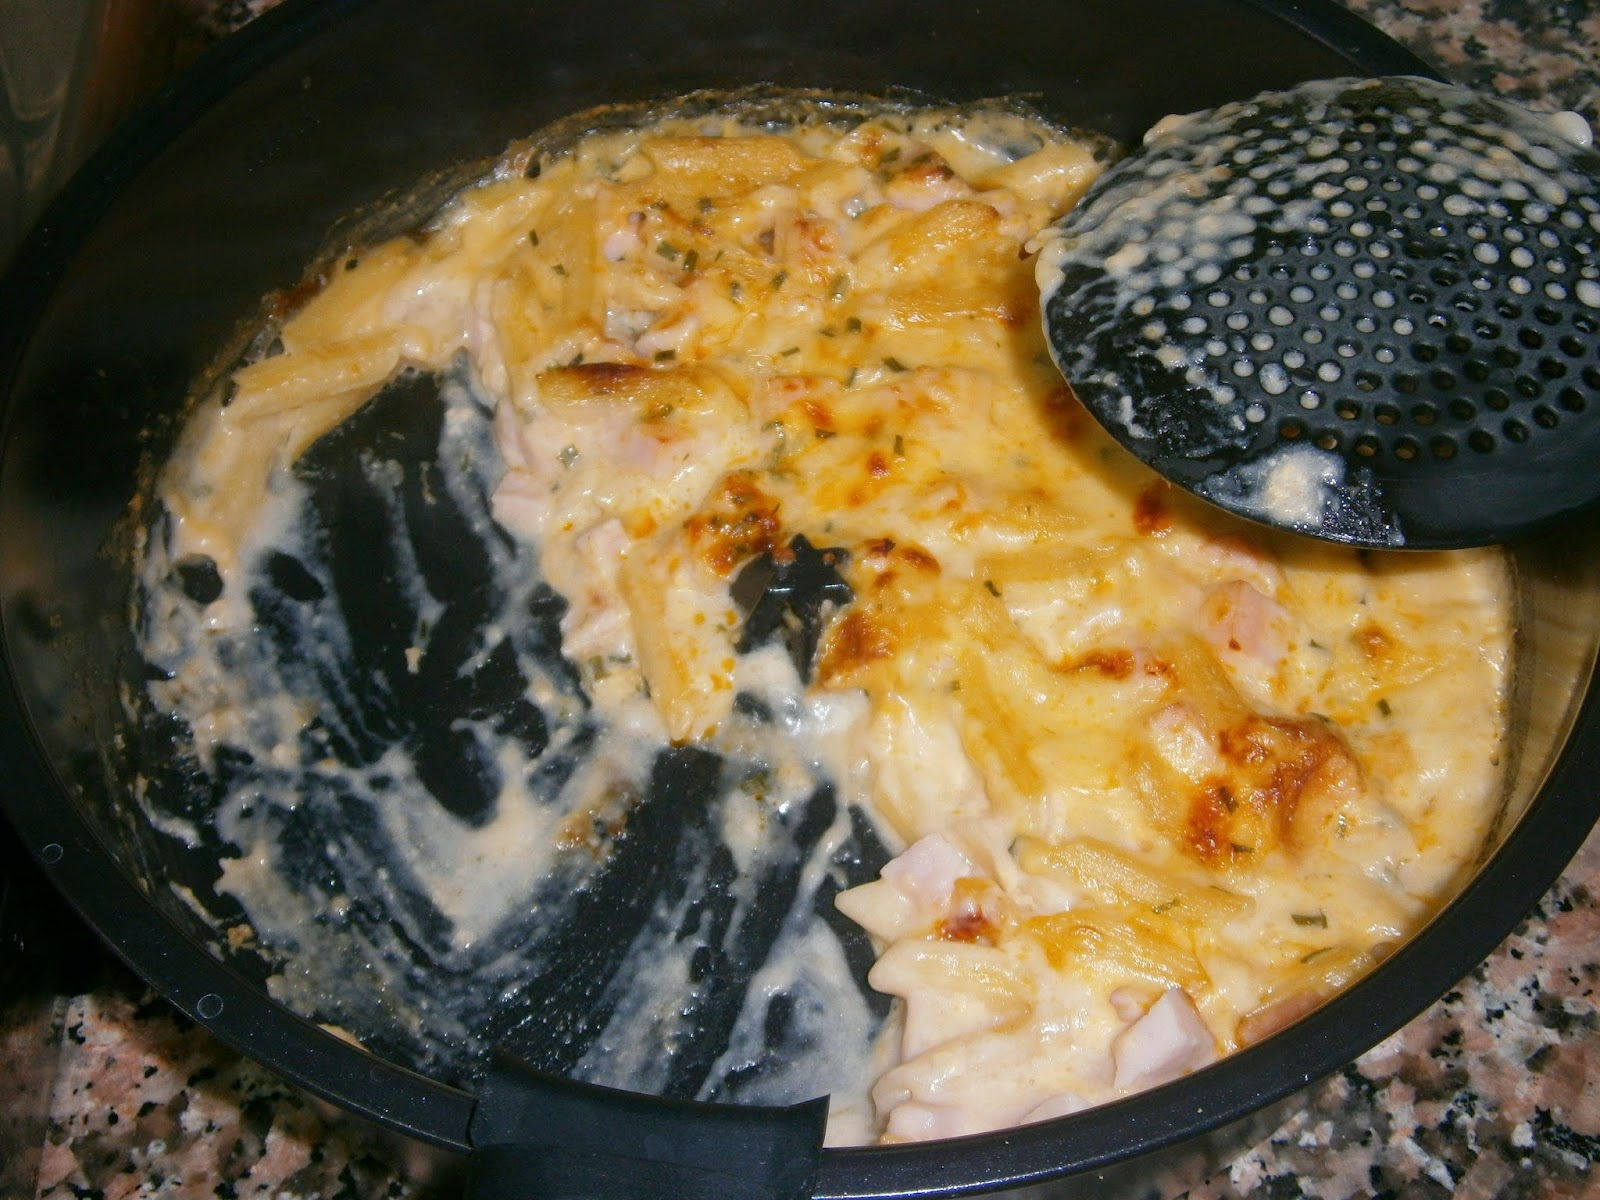 Cocina con xena macarrones con preparado de knorr - Macarrones con verduras al horno ...